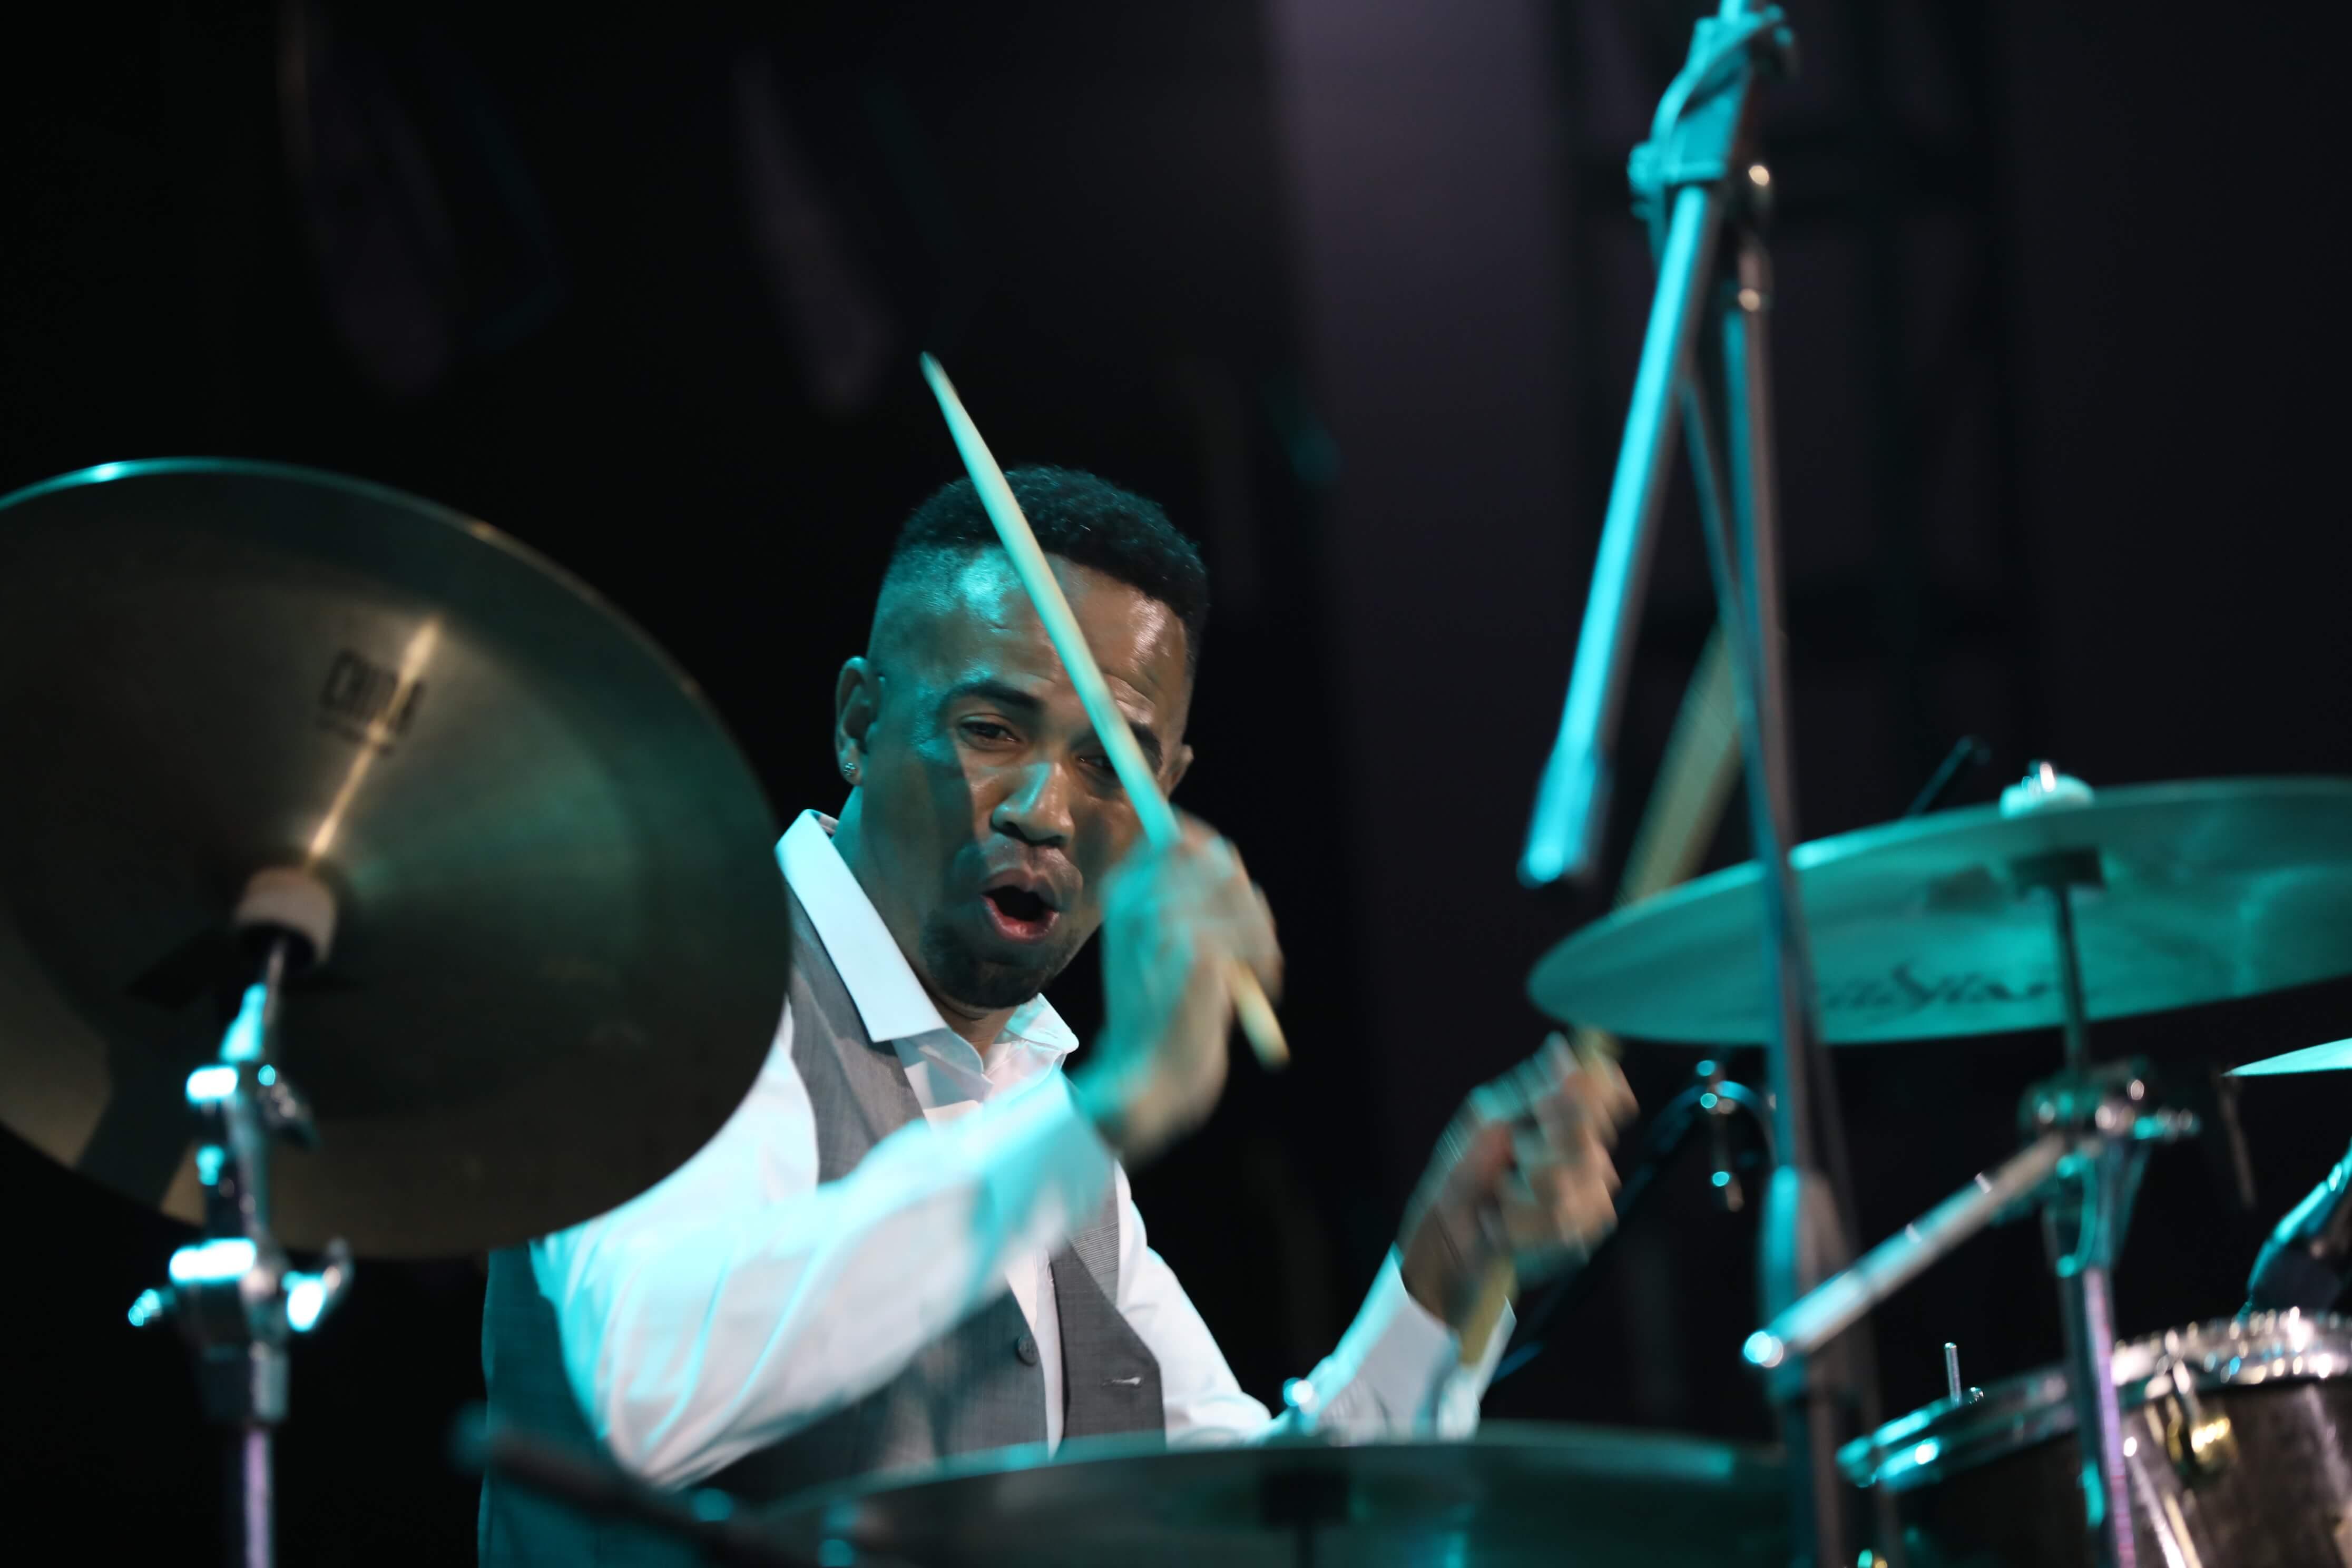 Diego Oliveira Drummer at Jimmy Hornet